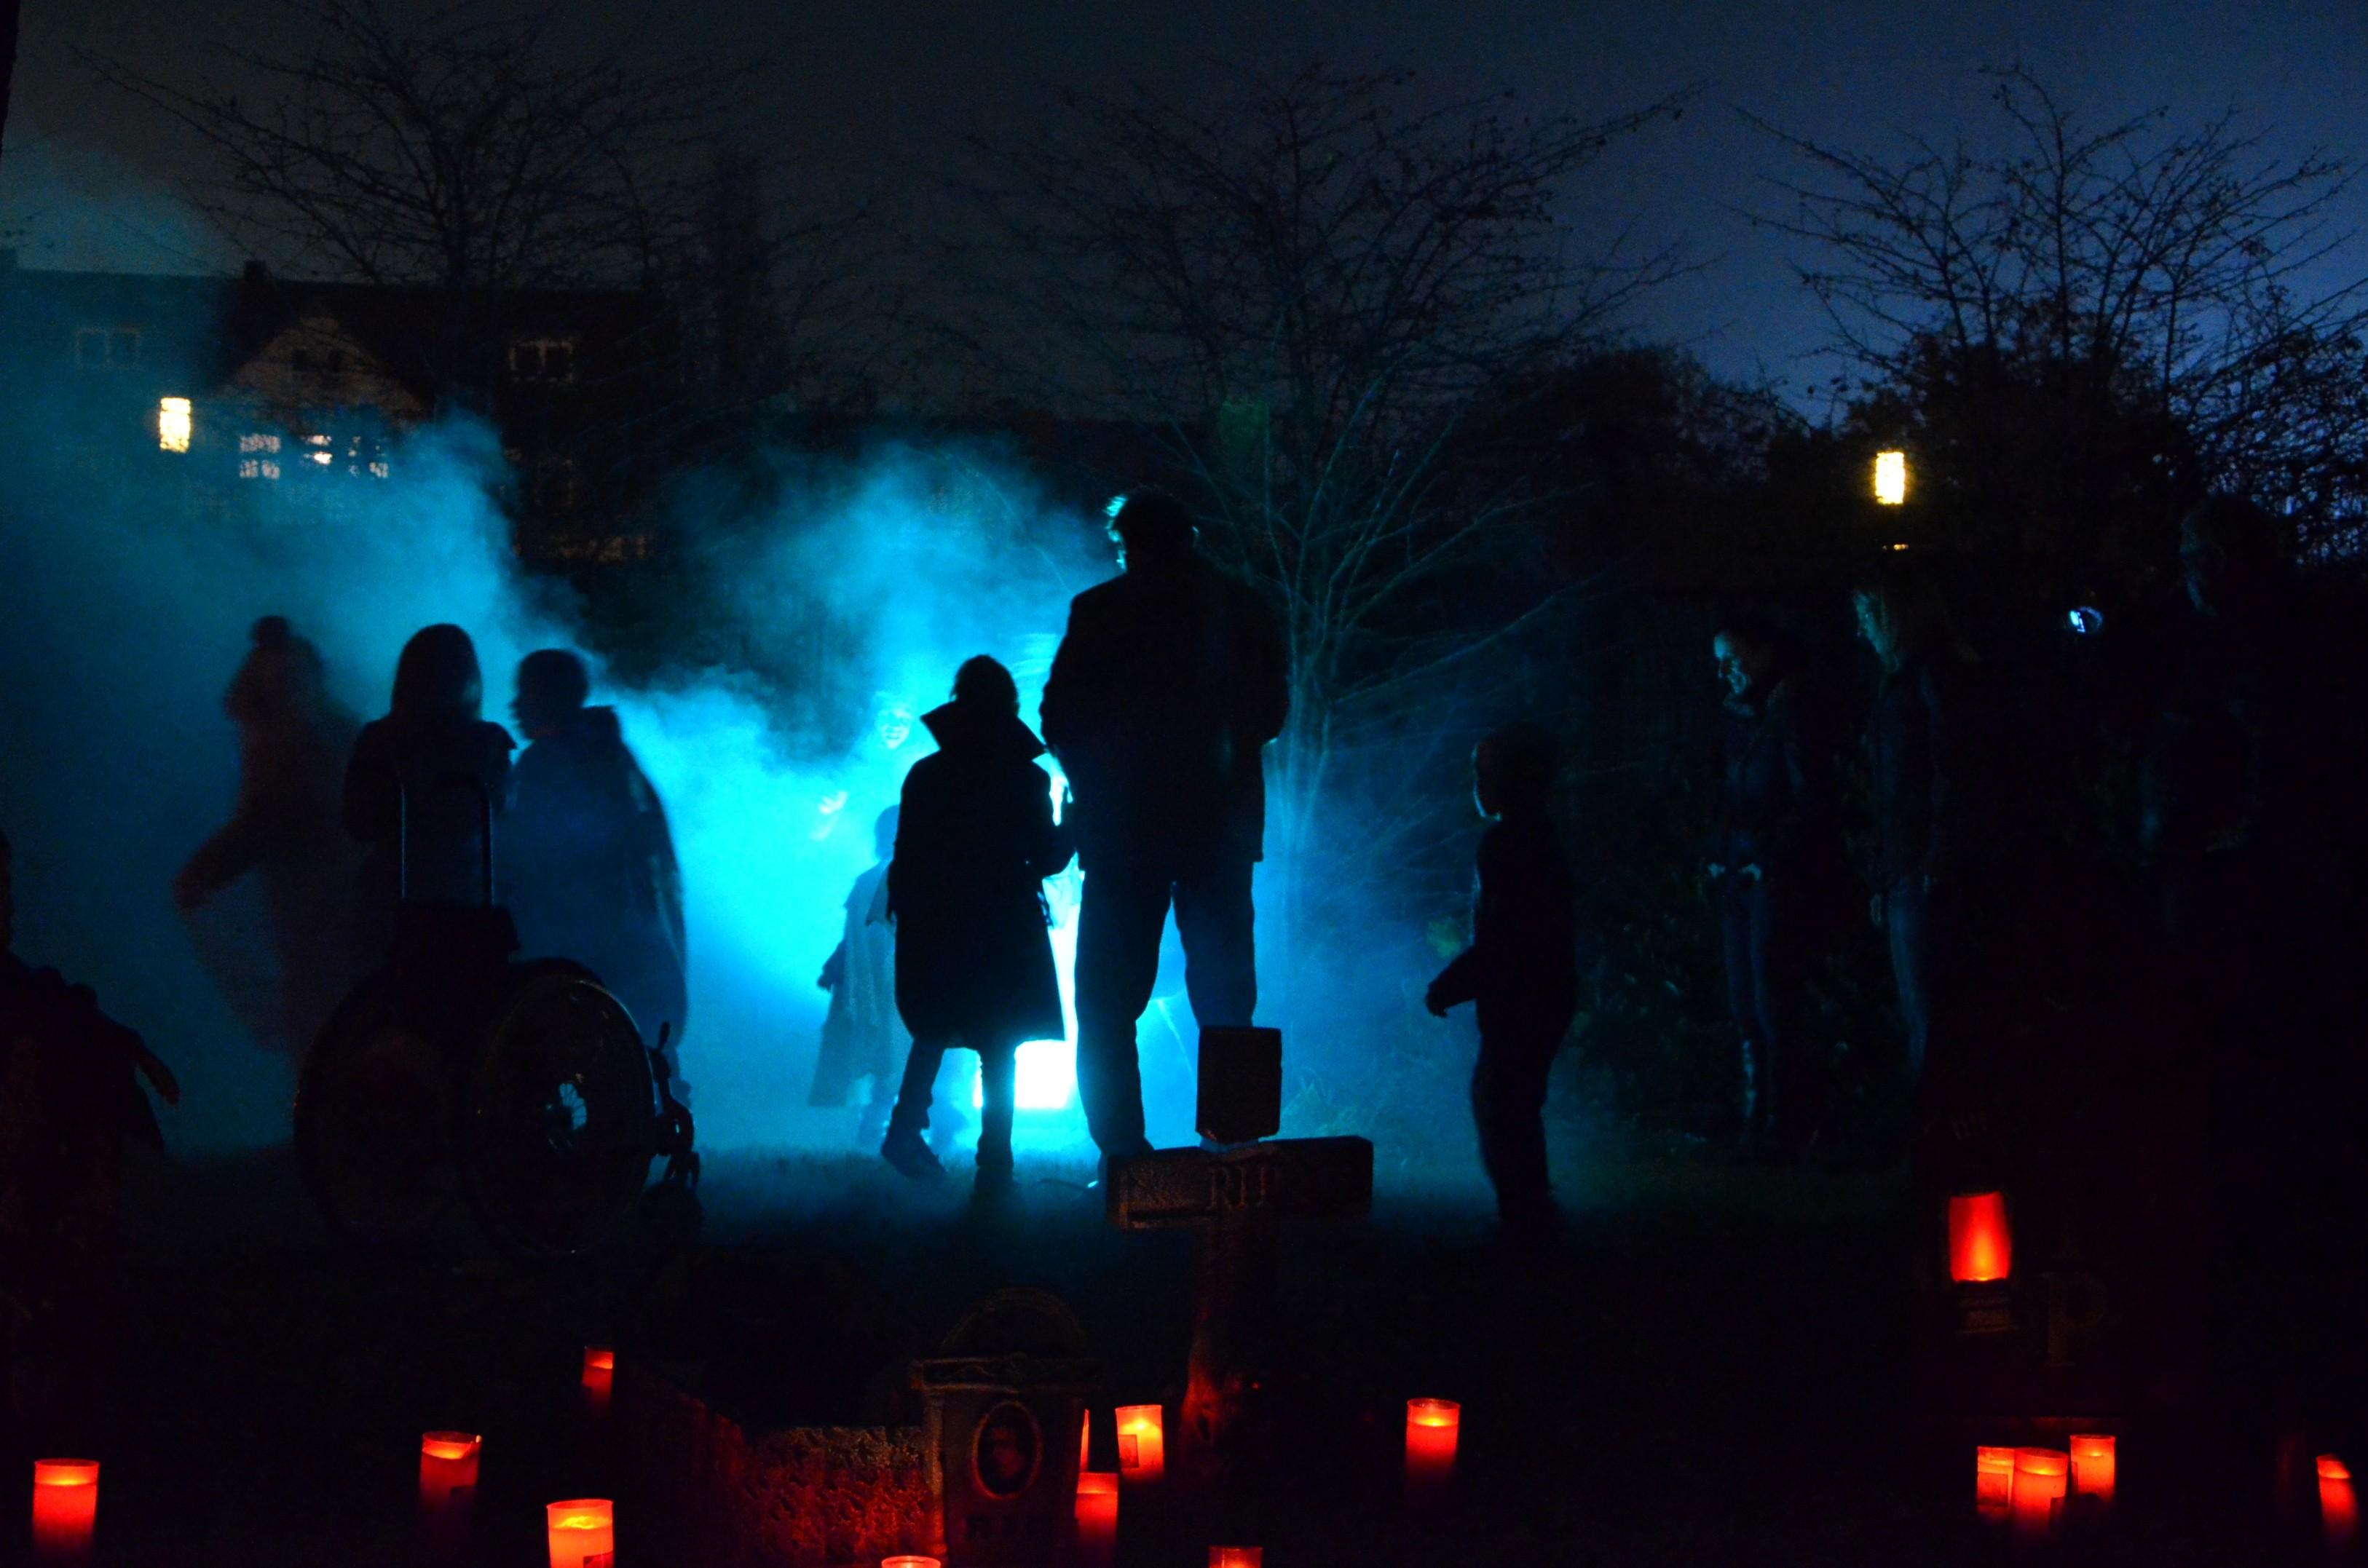 halloweennacht-im-zoo-2